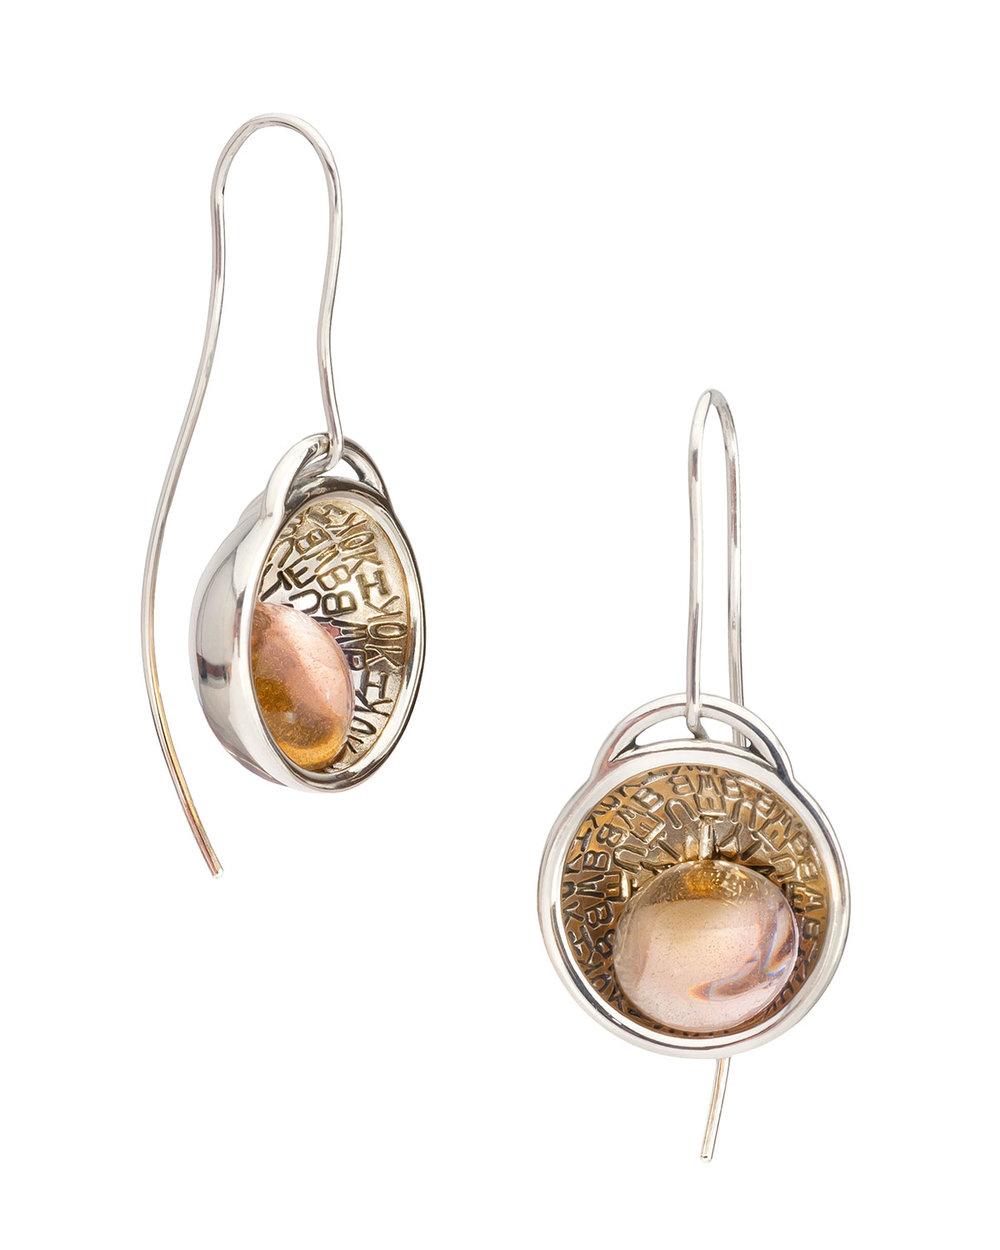 Amplify - Earrings | 2018Sterling silver, dyed resin4.8H x 2W x 2D cm